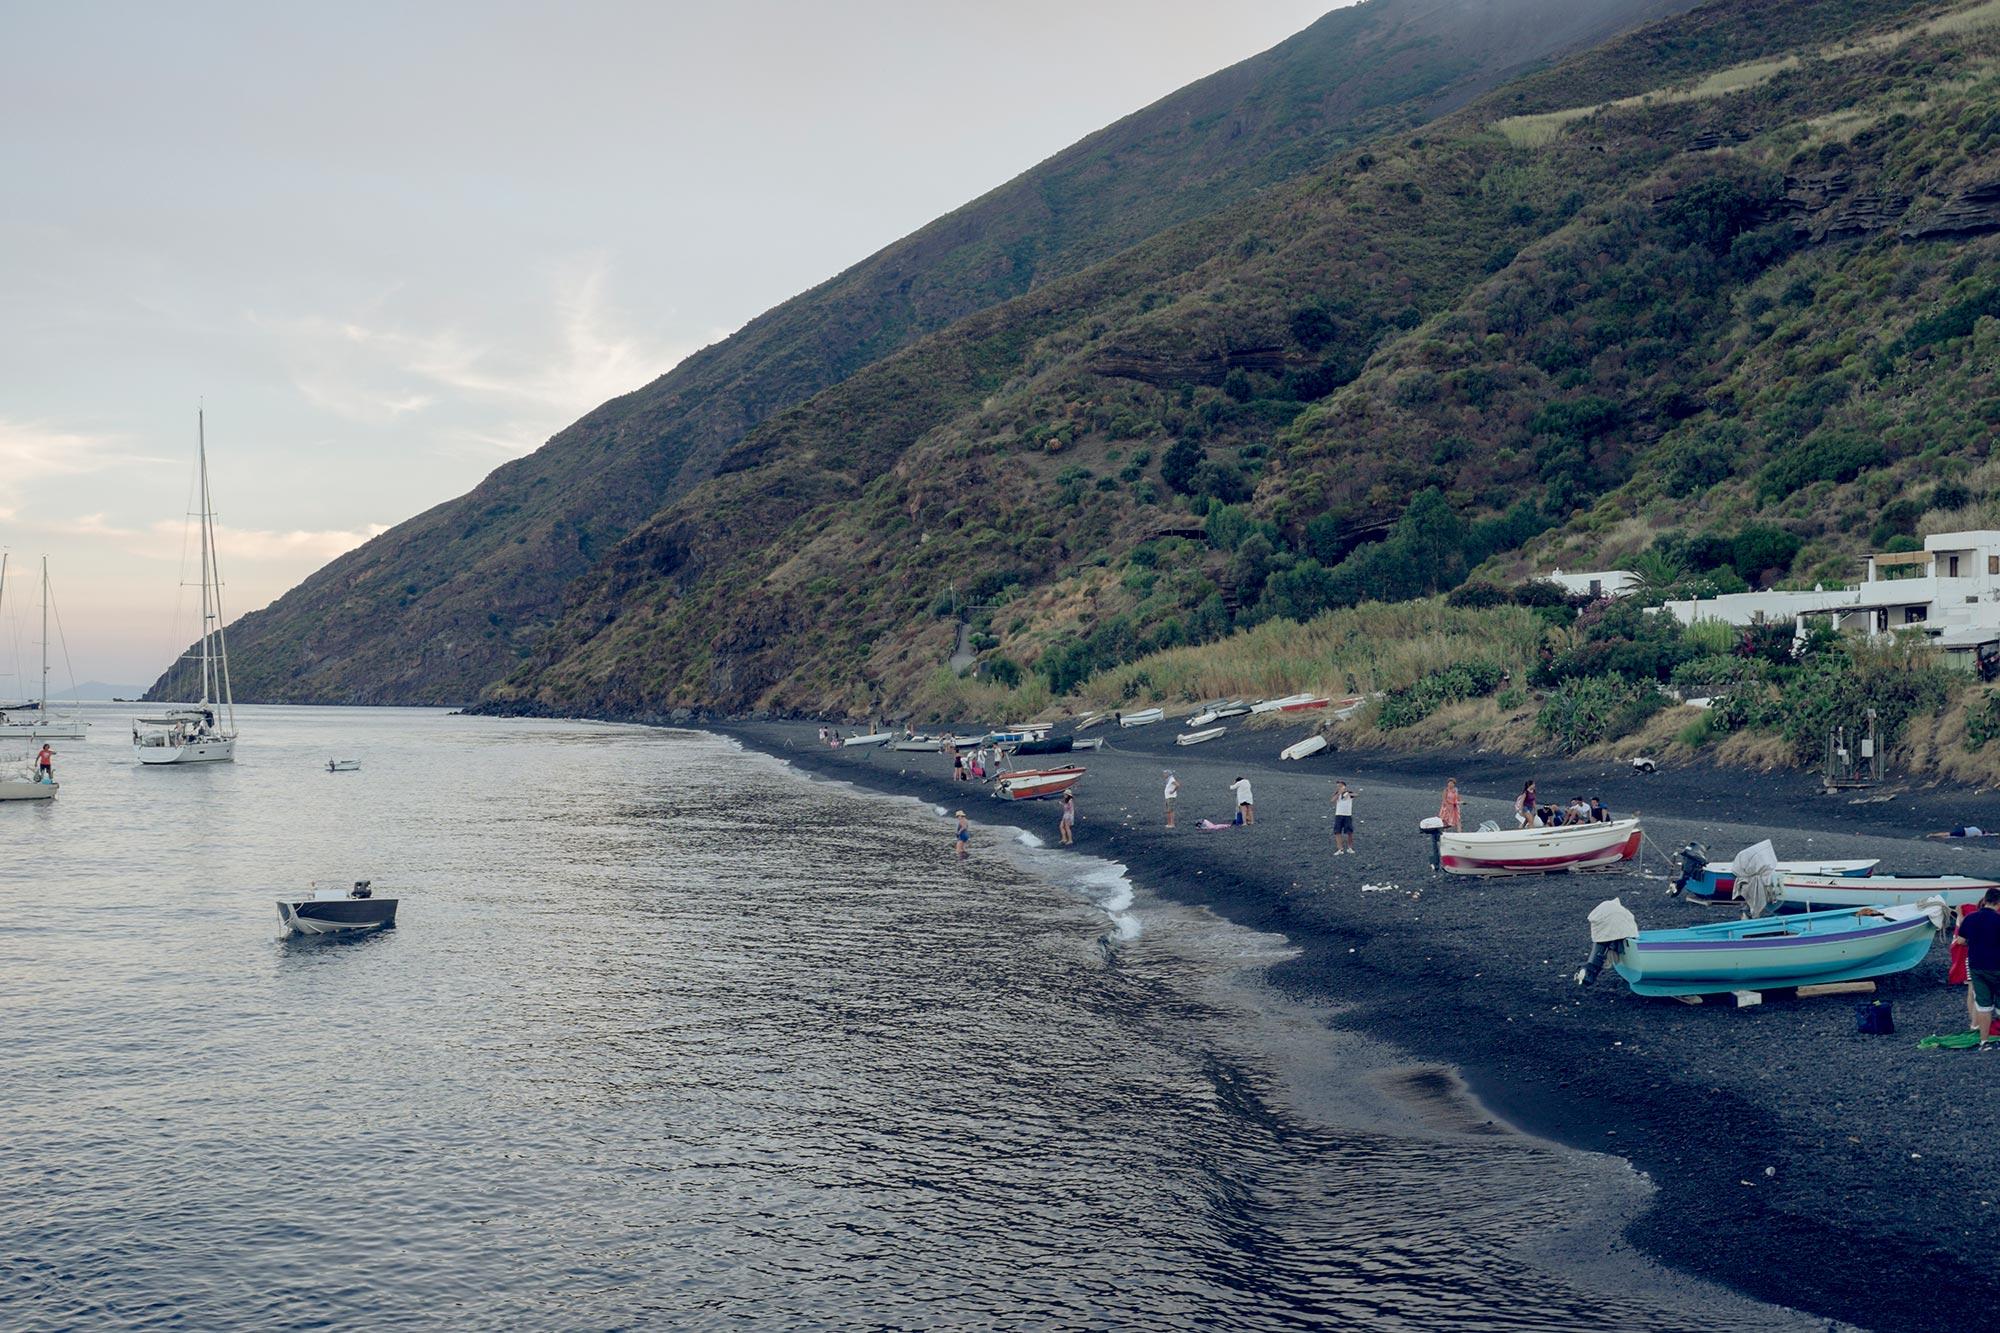 italy-sicilia-eolie-stromboli-italy-sicilia-eolie-stromboli-black-beach-boats1